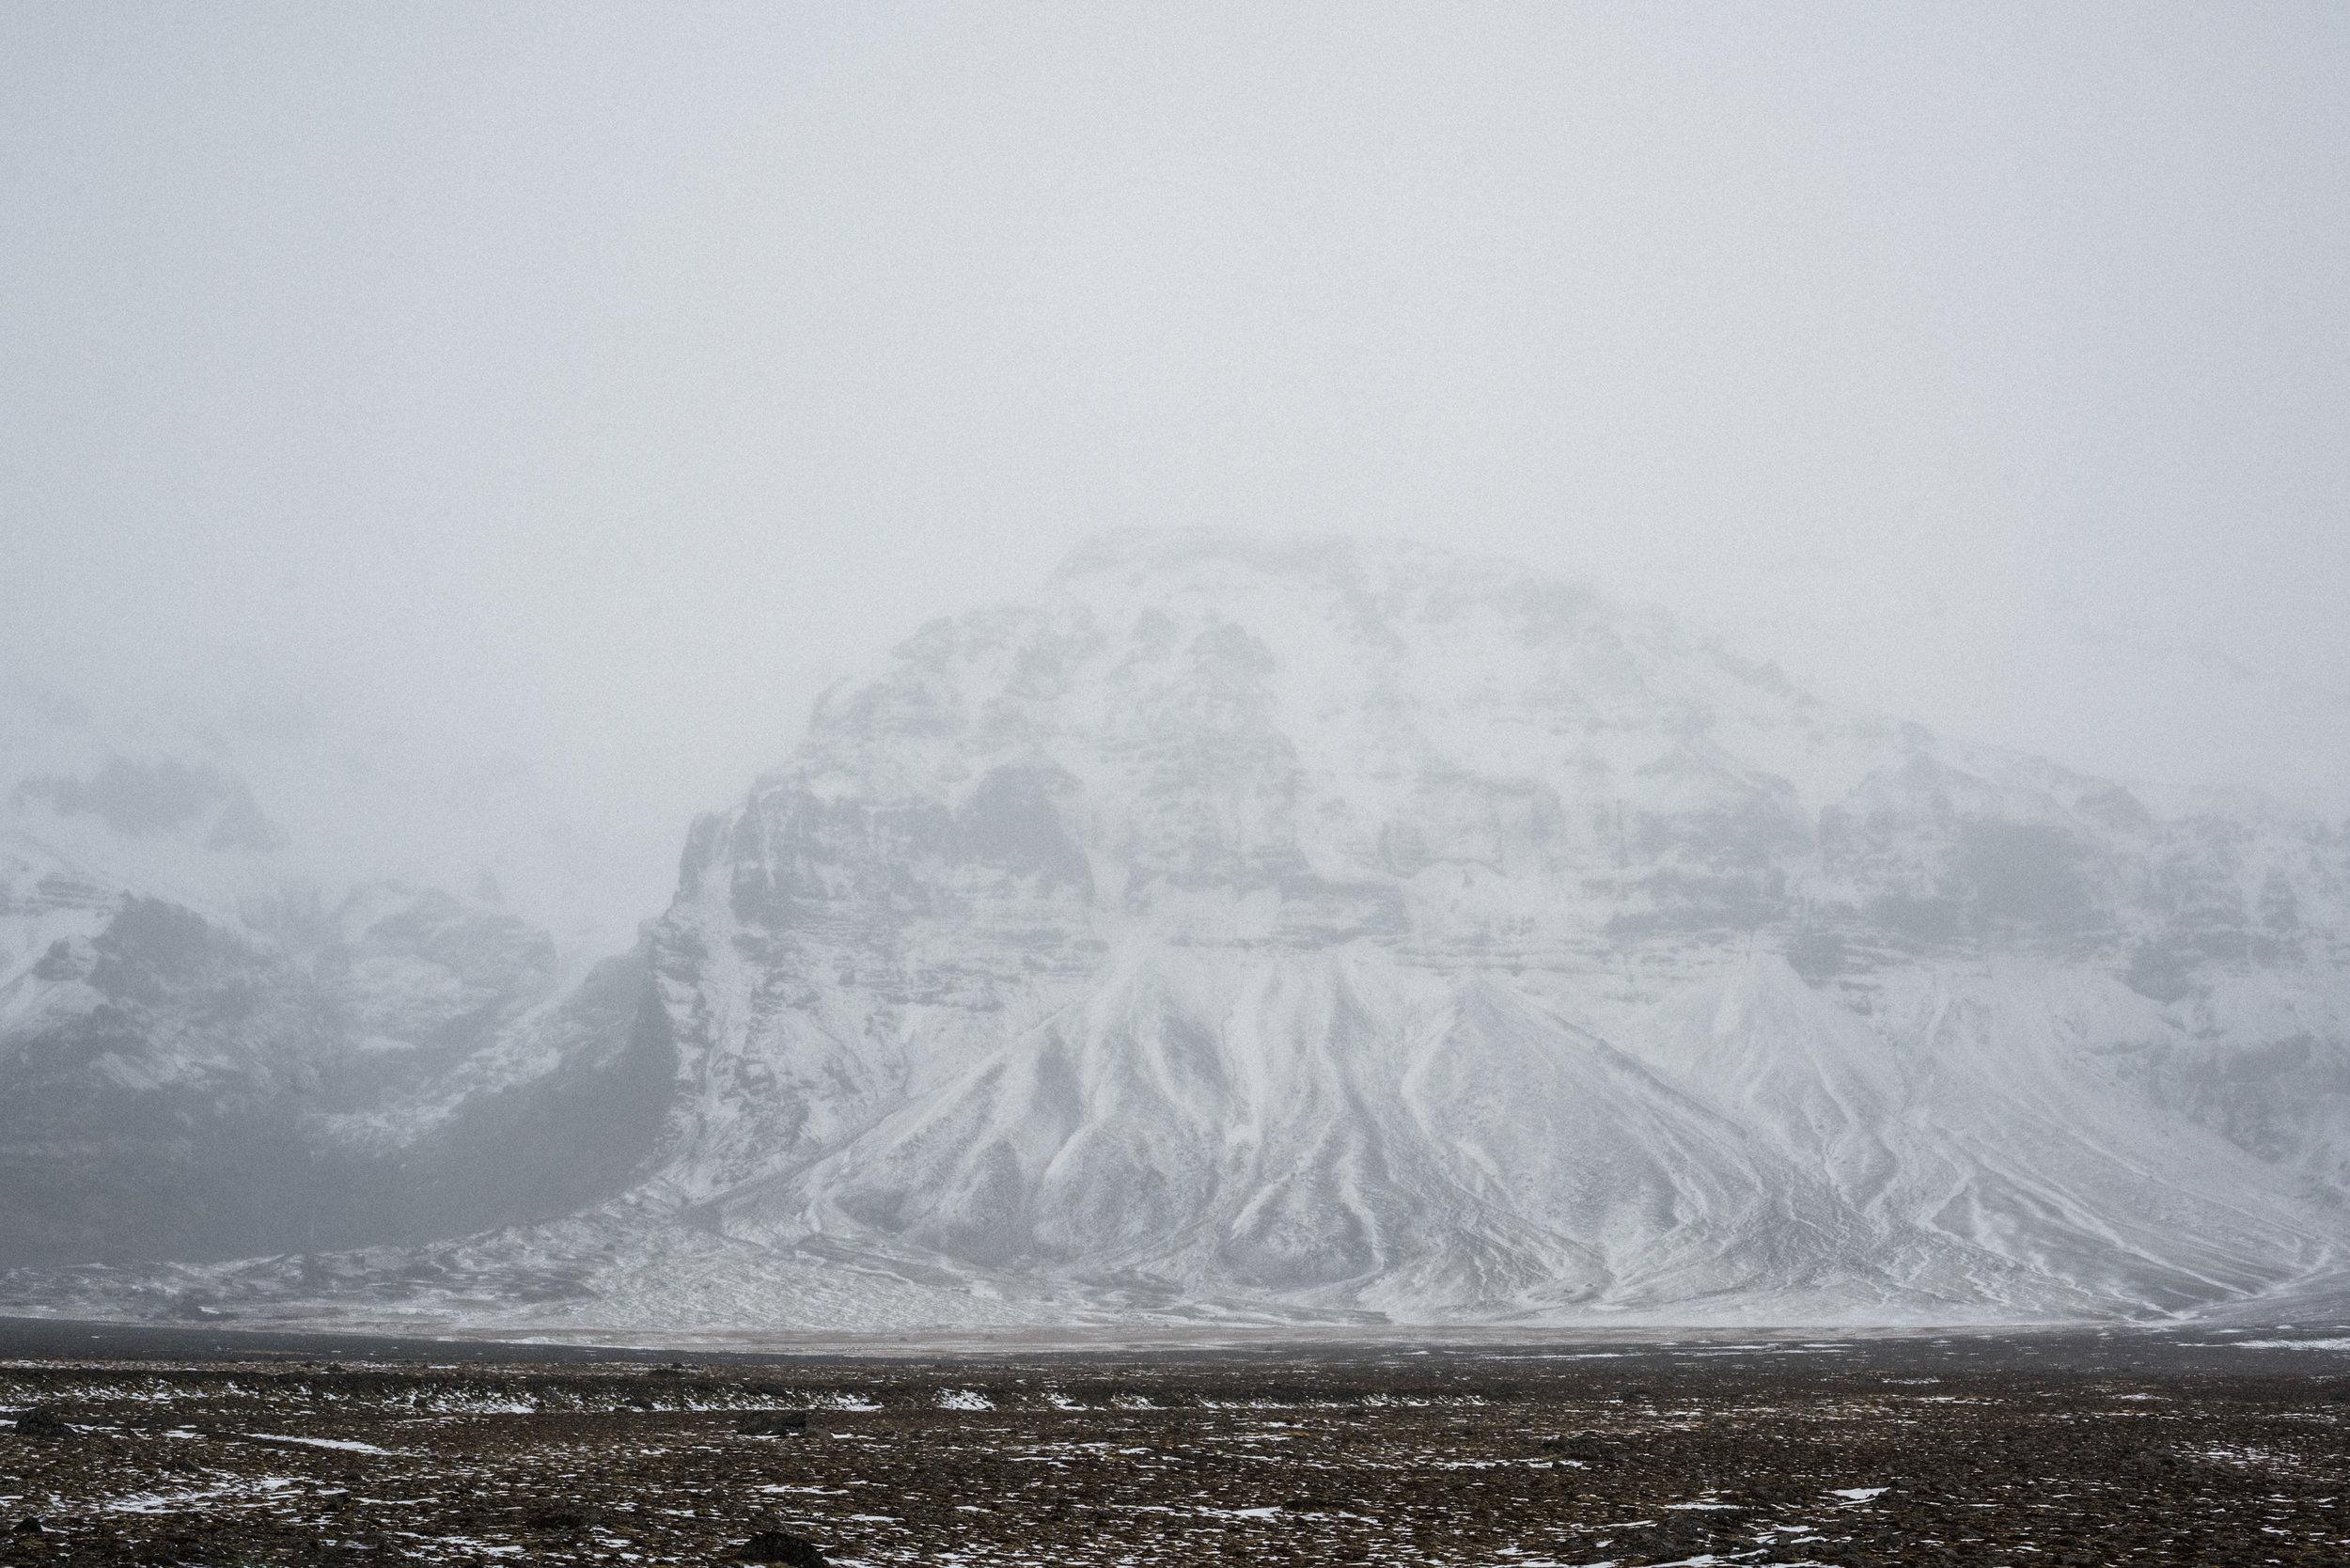 ICELAND_WOMAN_PHOTOGRAPHER_TARASHUPE_OUTDOOR_PHOTOGRAPHY_104.jpg